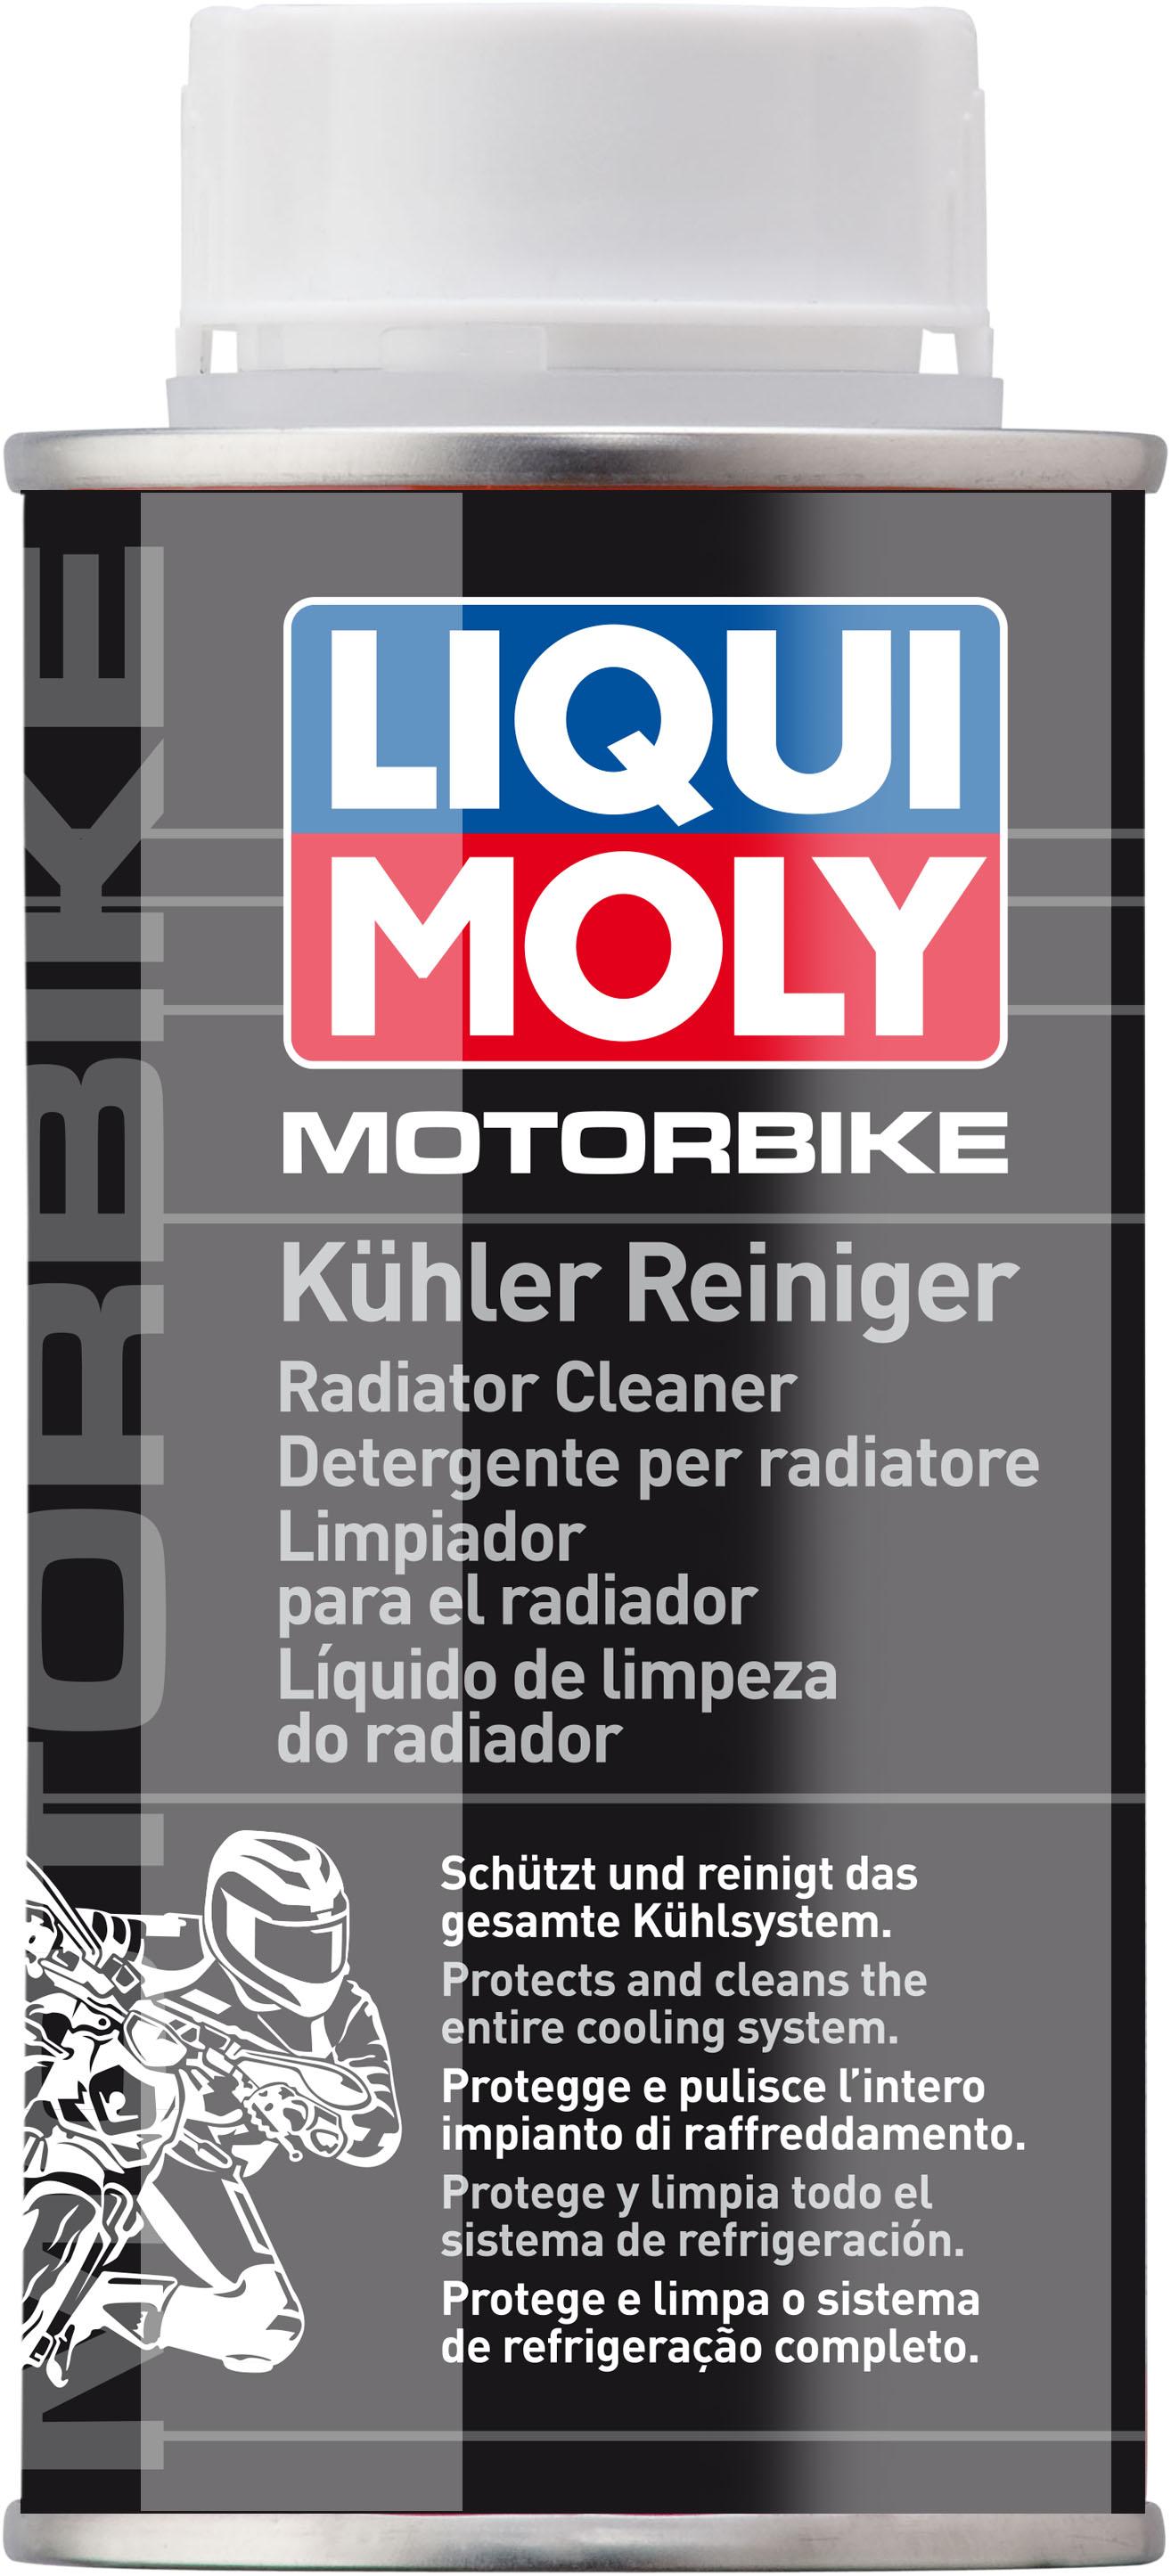 motoroel king liqui moly motorbike k hler reiniger 150 ml. Black Bedroom Furniture Sets. Home Design Ideas